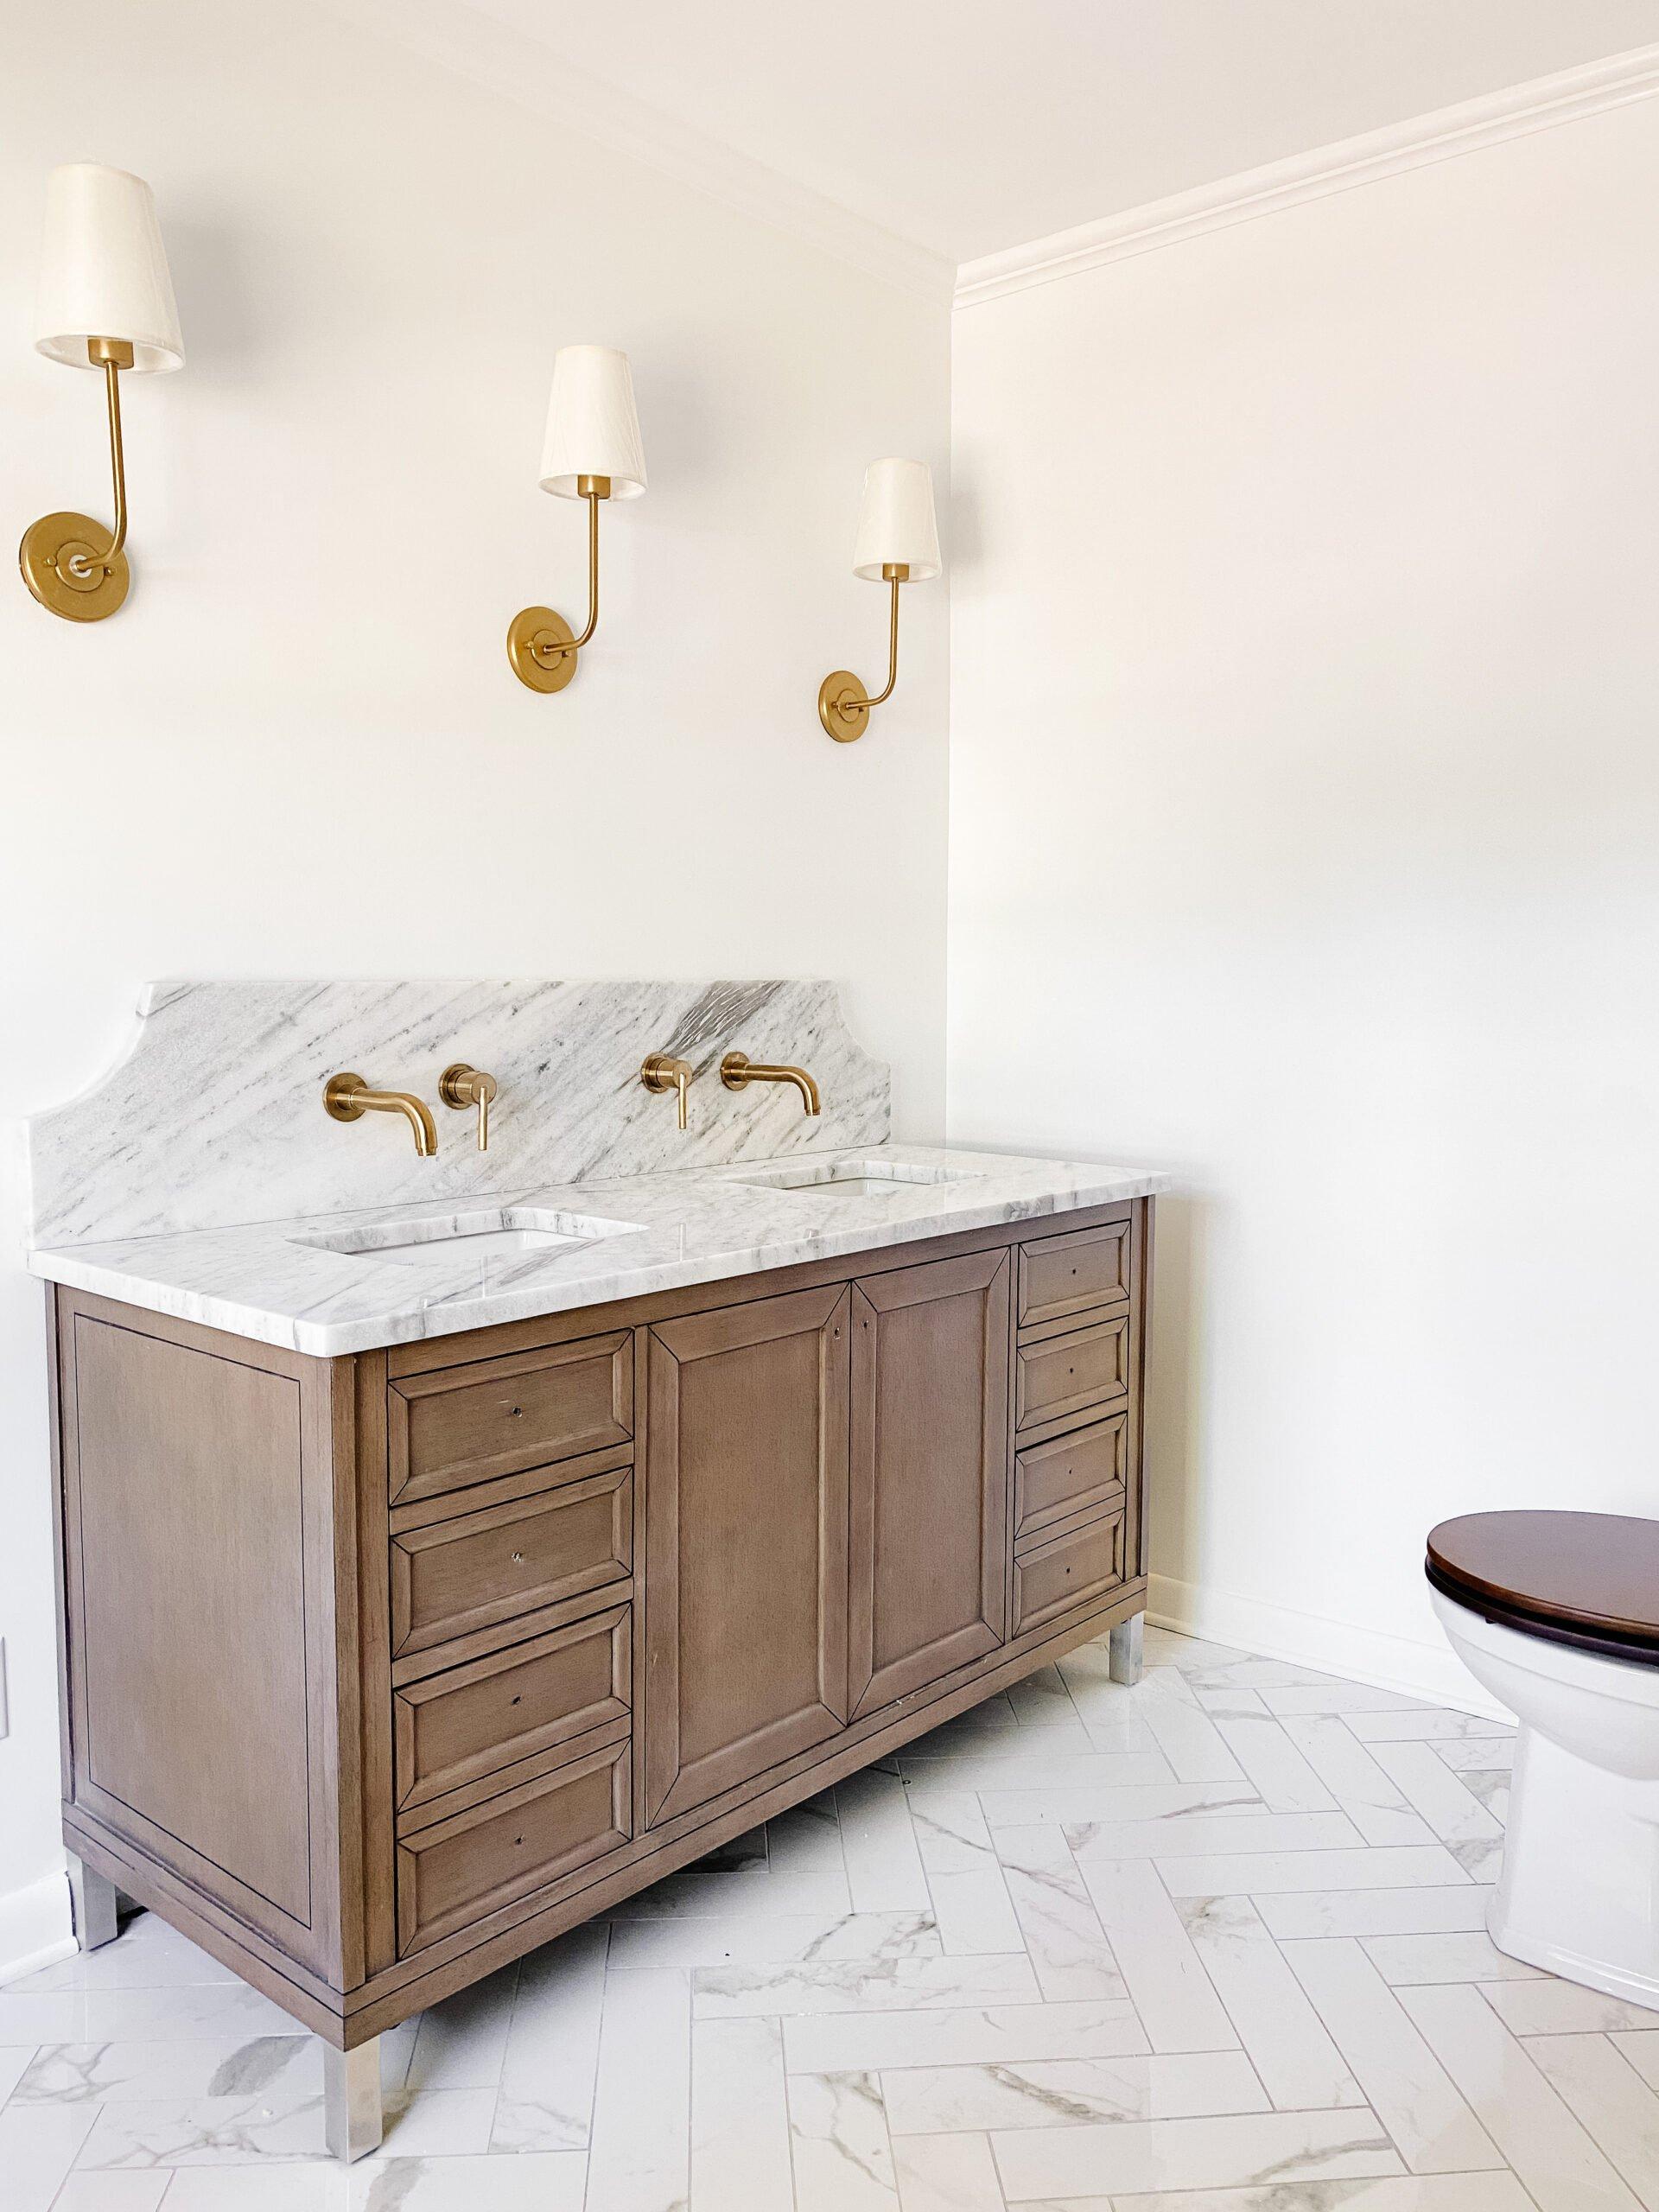 Our En Suite Bathroom Remodel – We Have Faucets!